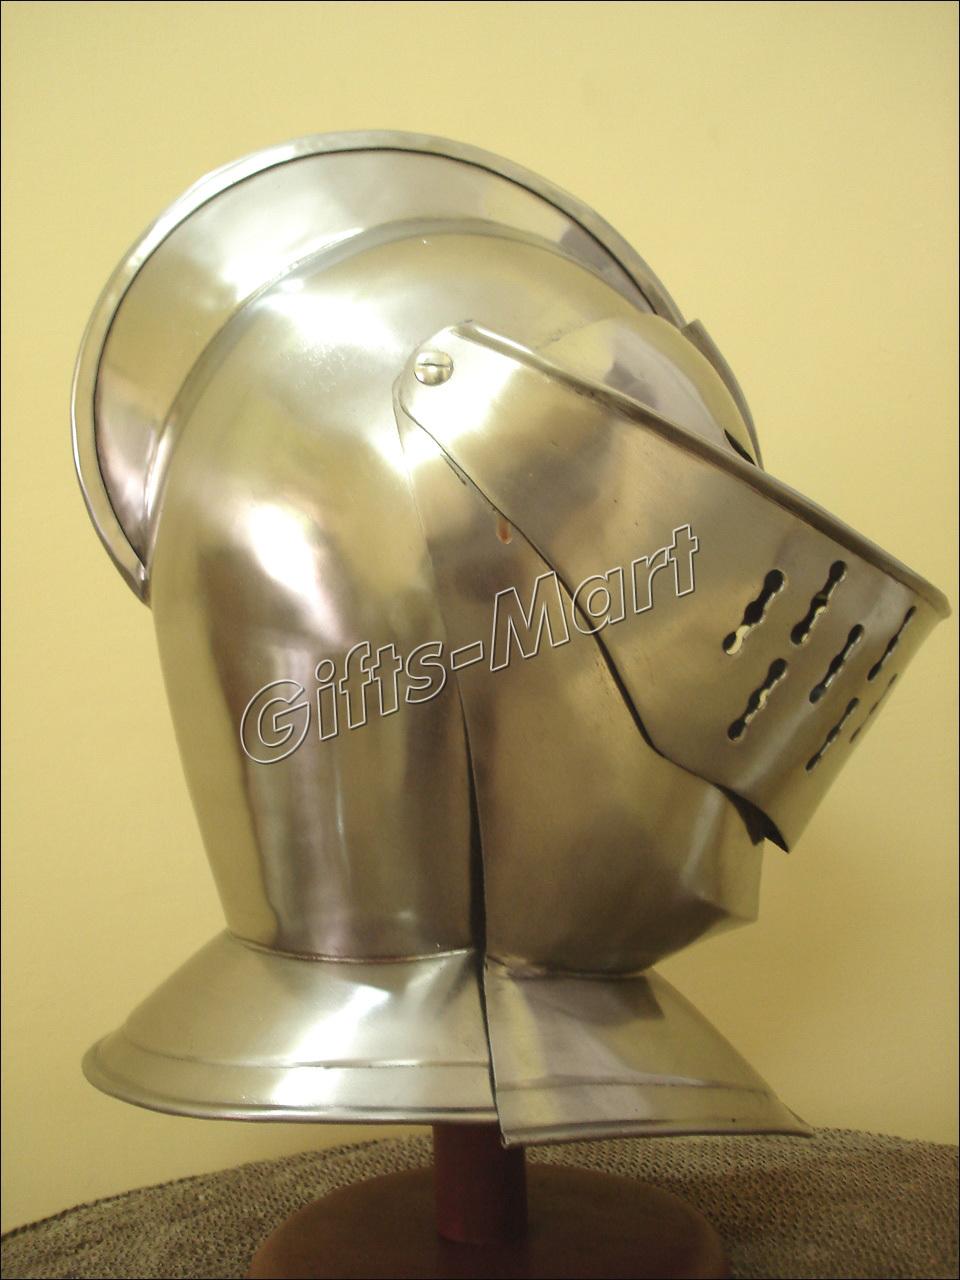 EUROPEAN CLOSED HELMET, Wearable Medieval Knight ARMOR GLADIATOR KNIGHT MAXIMUS